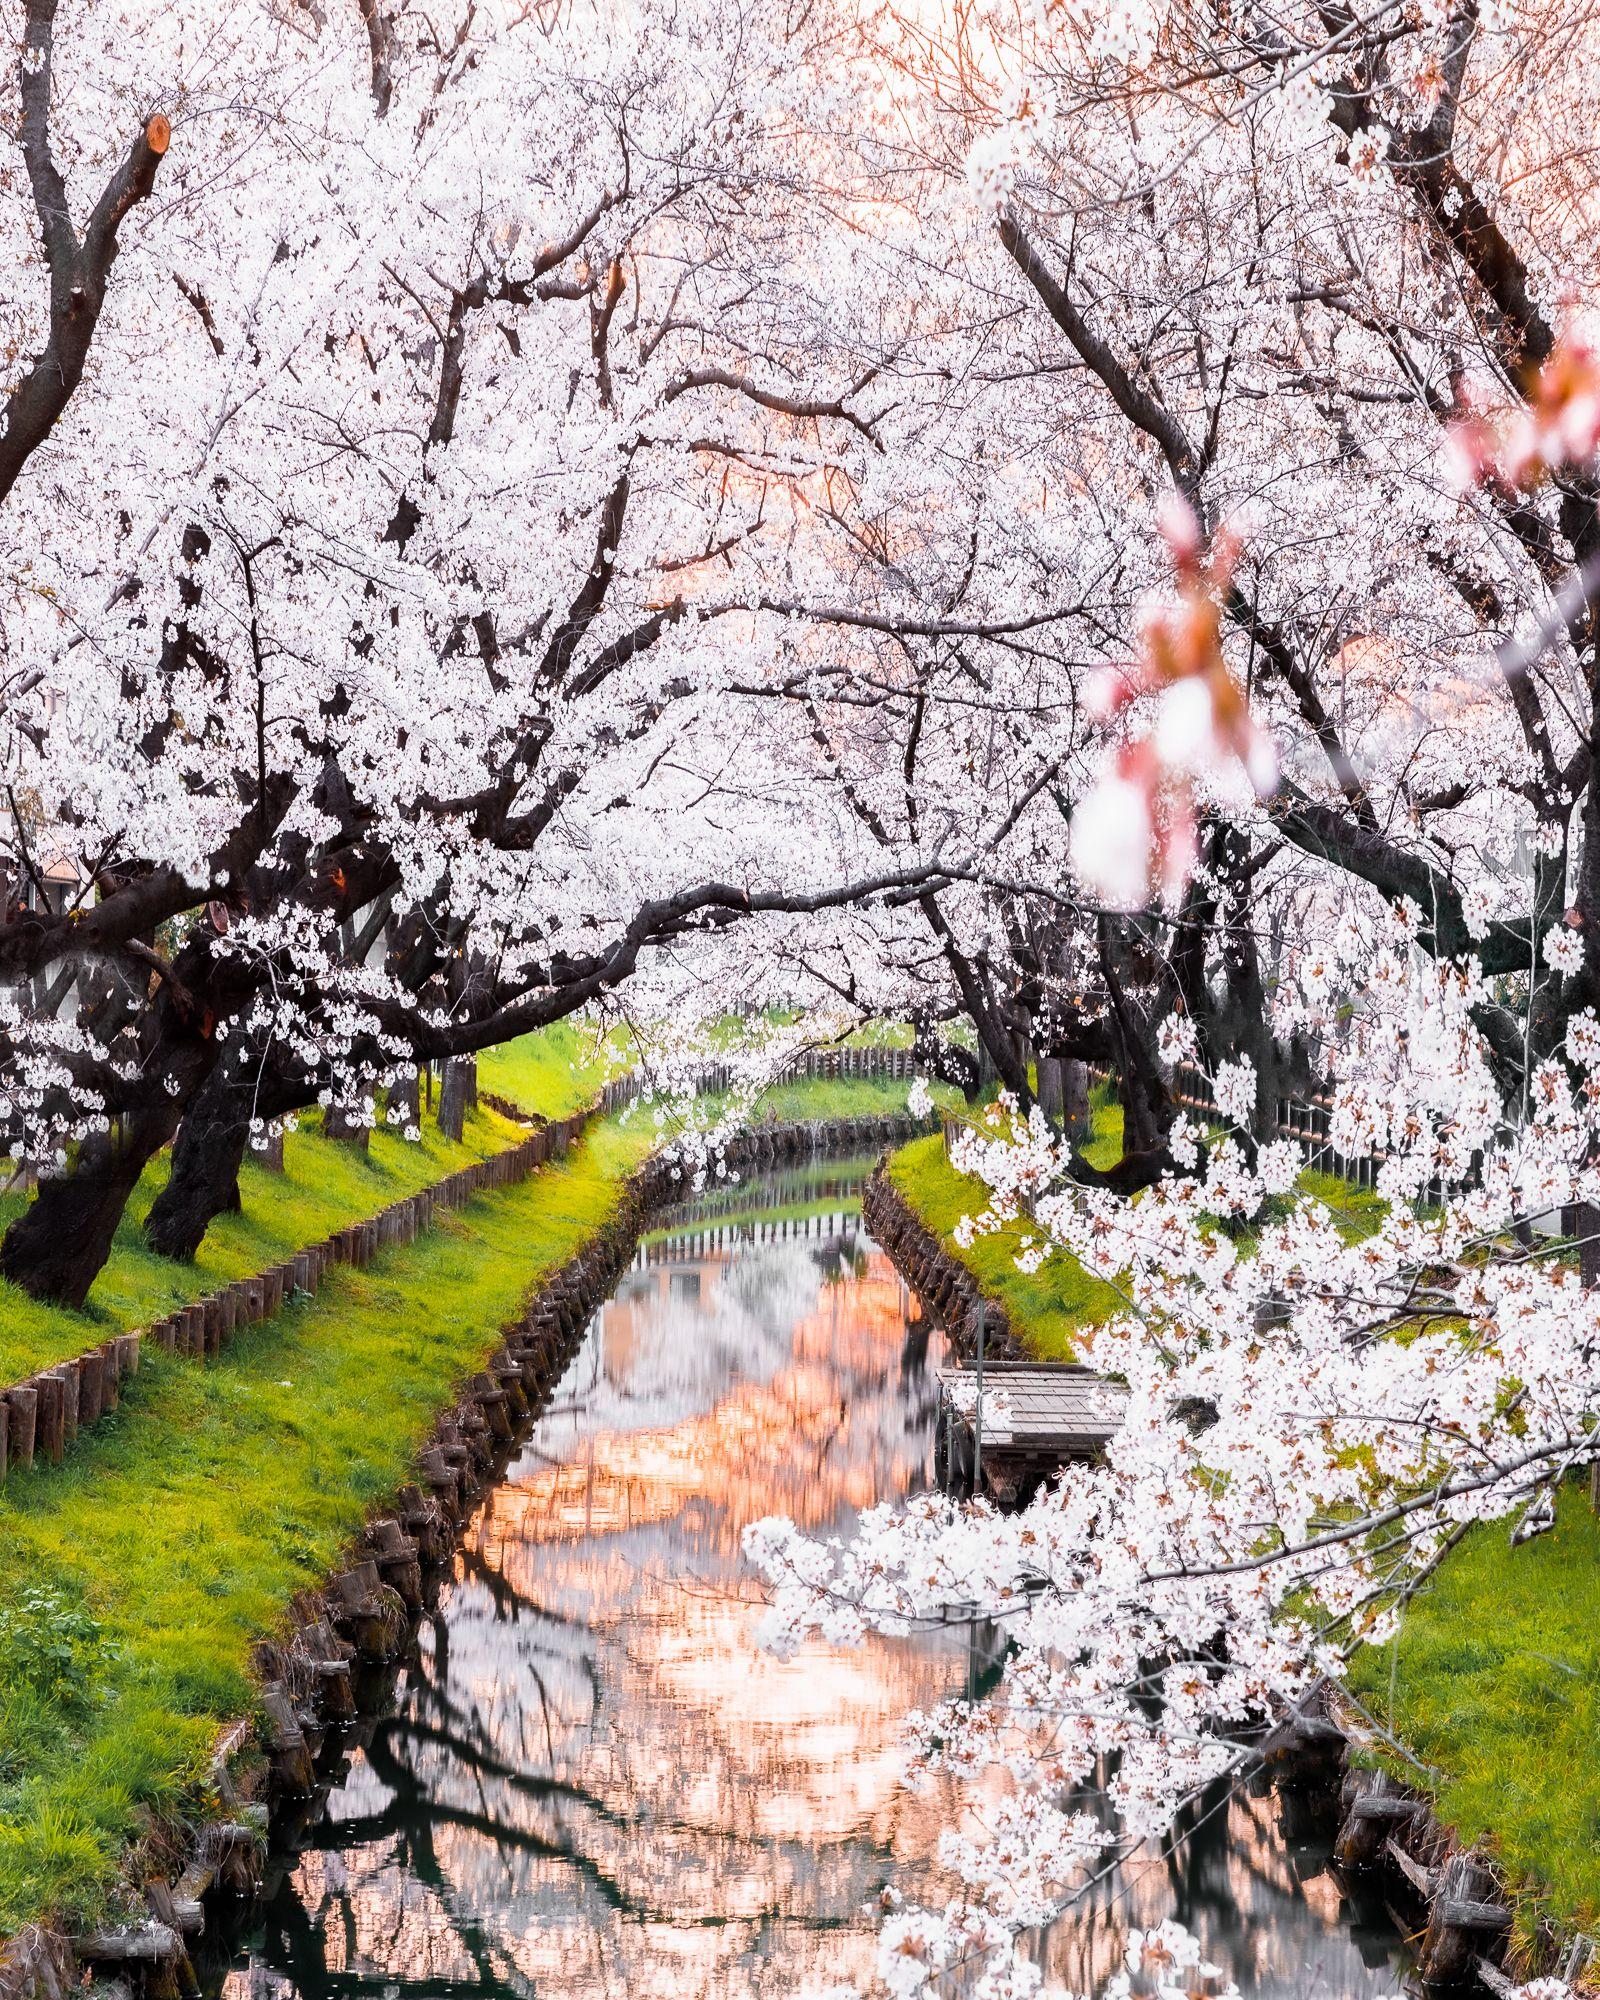 Best Sakura Photo In Japan Cherry Blossom In Kawagoe North Of Tokyo In Saitama Cherry Blossom Japan Japan Photo Spots